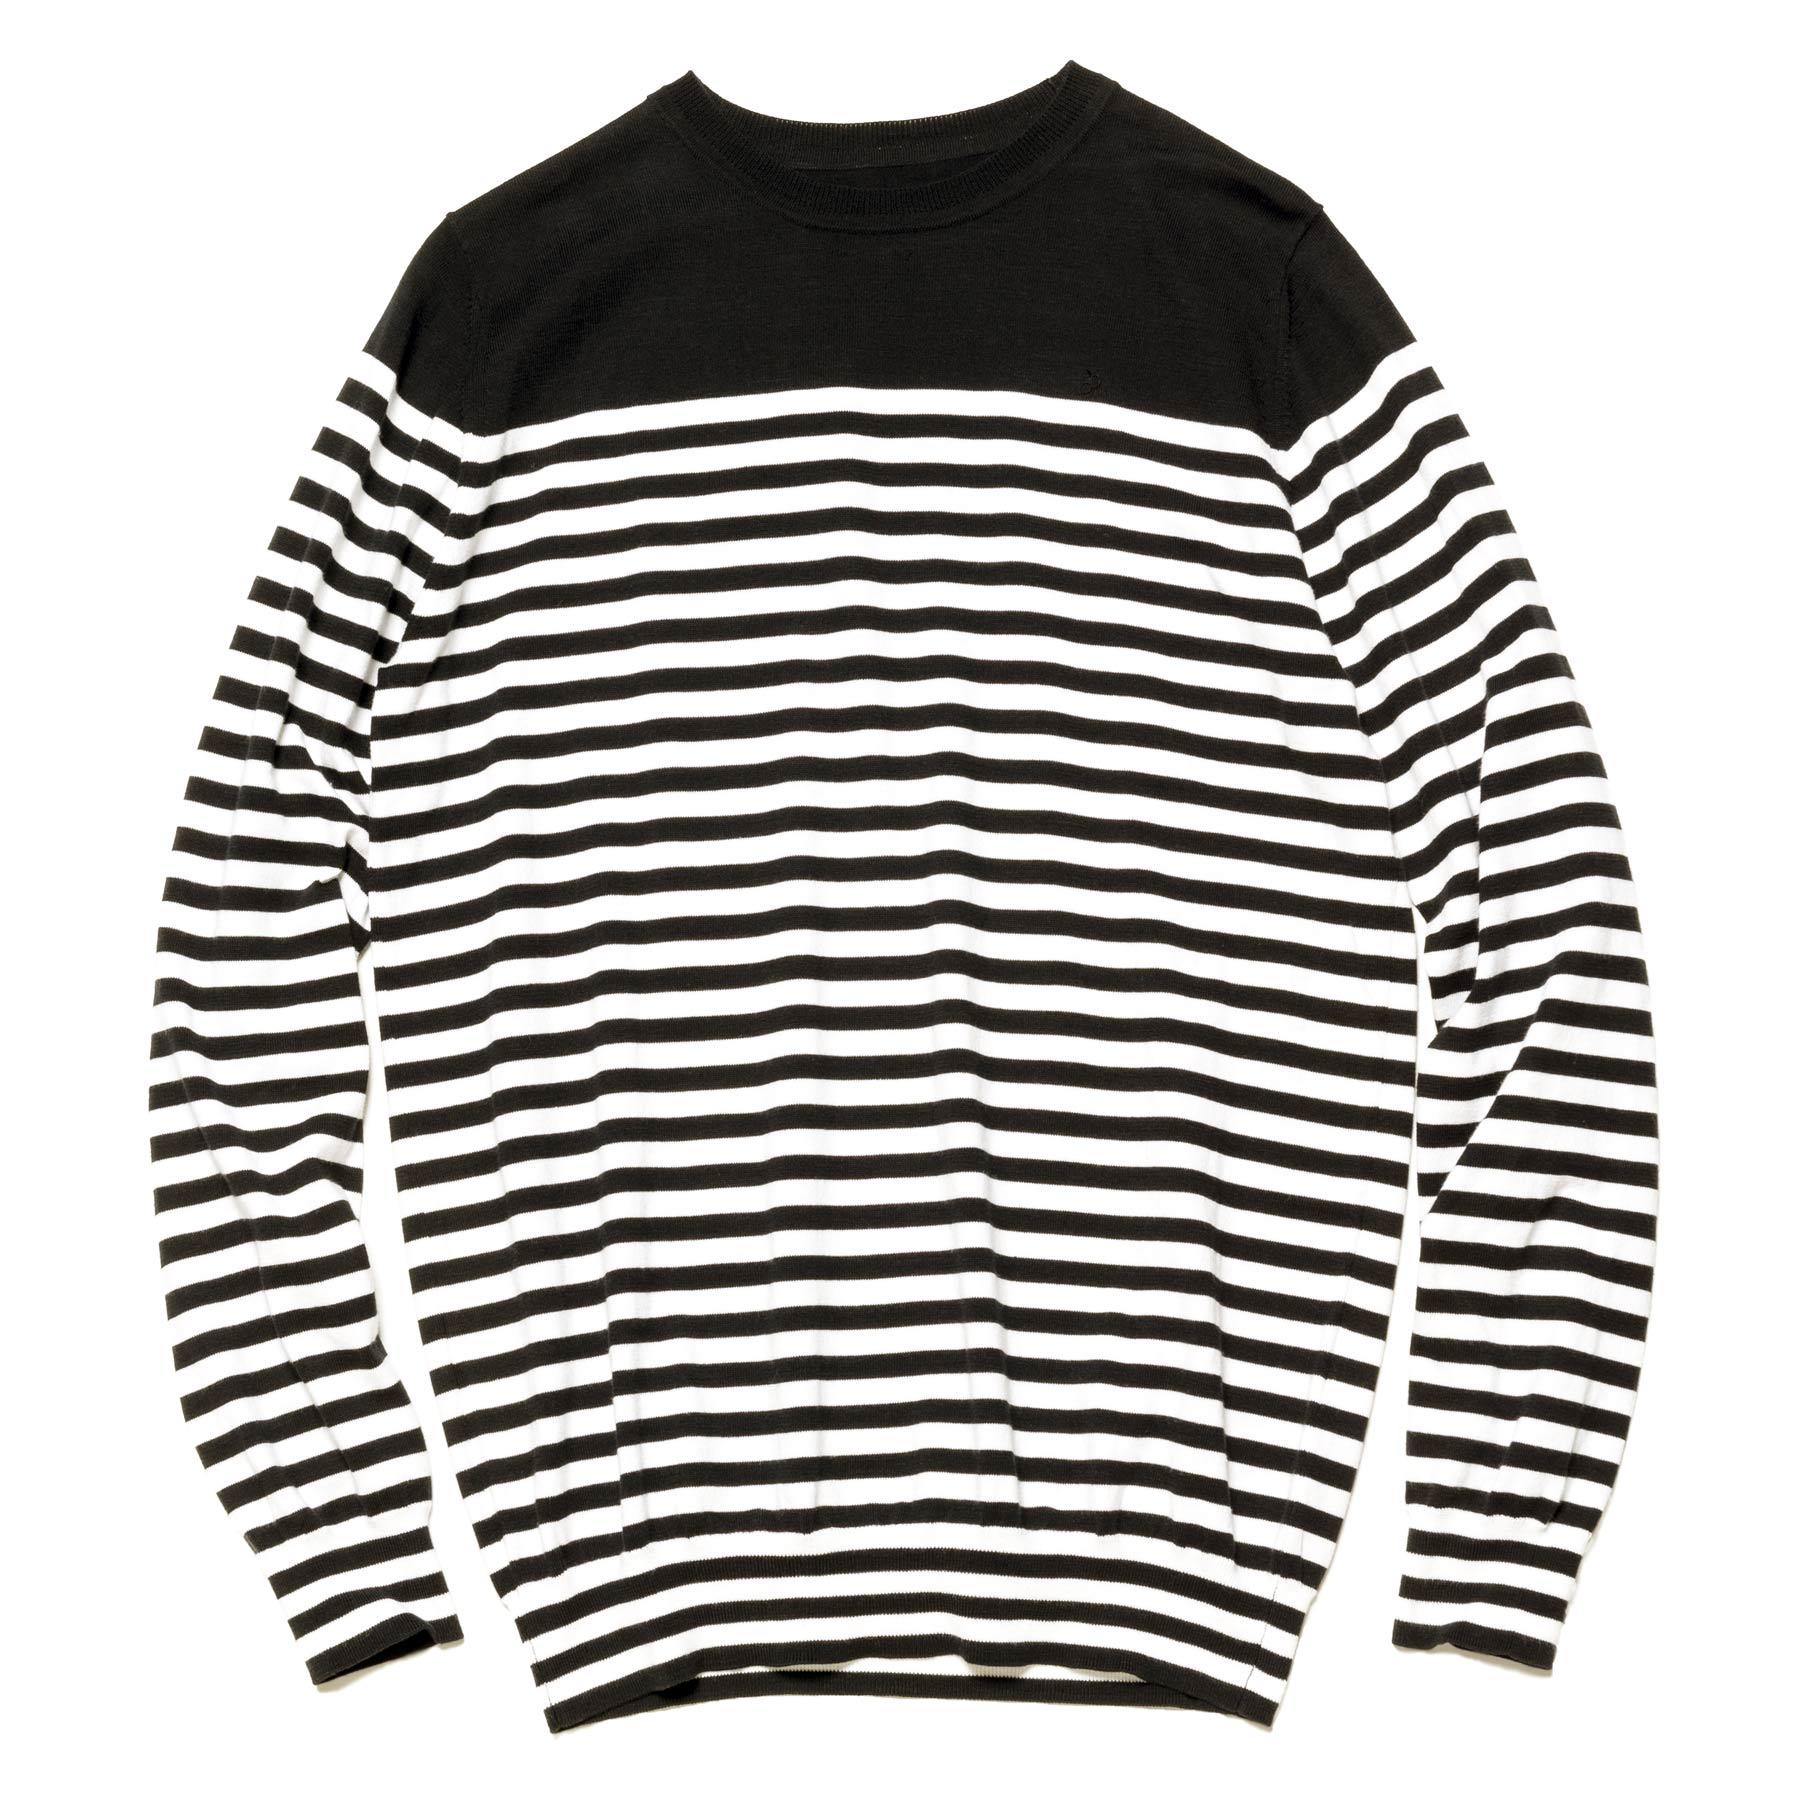 uniform experiment / BORDER CREW NECK KNIT -Black/White